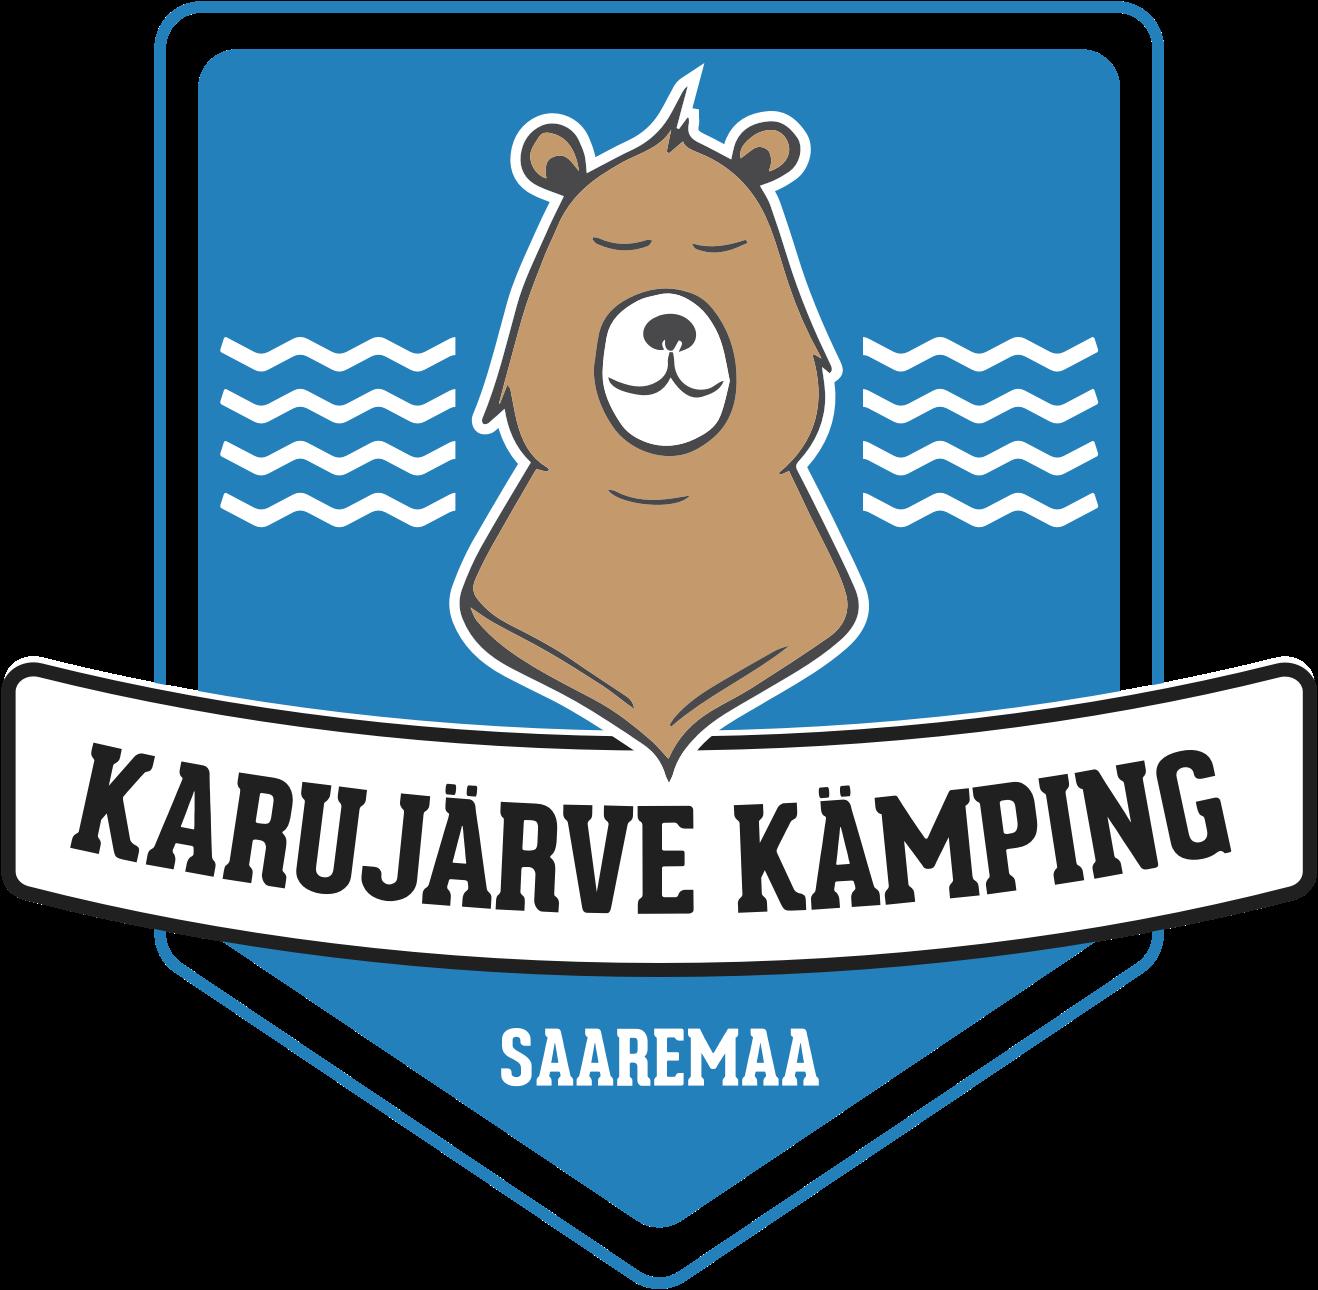 Karujärve Kämping